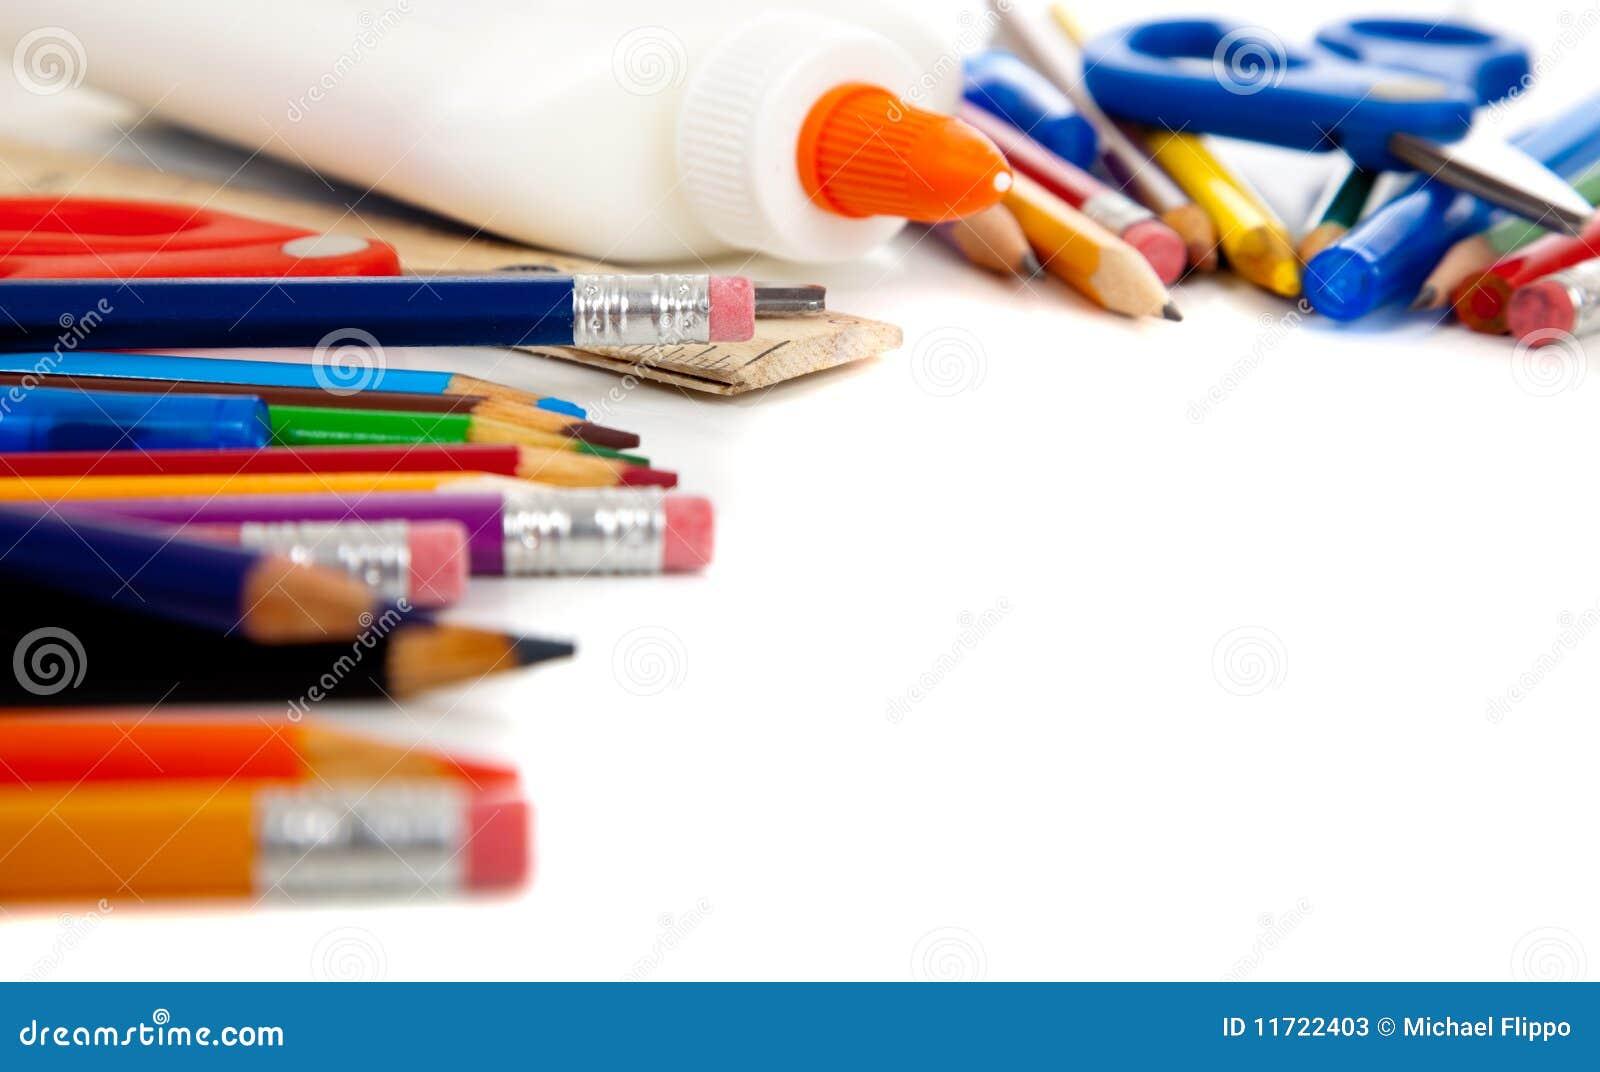 Various School Supplies On A White Background Stock Photos ...